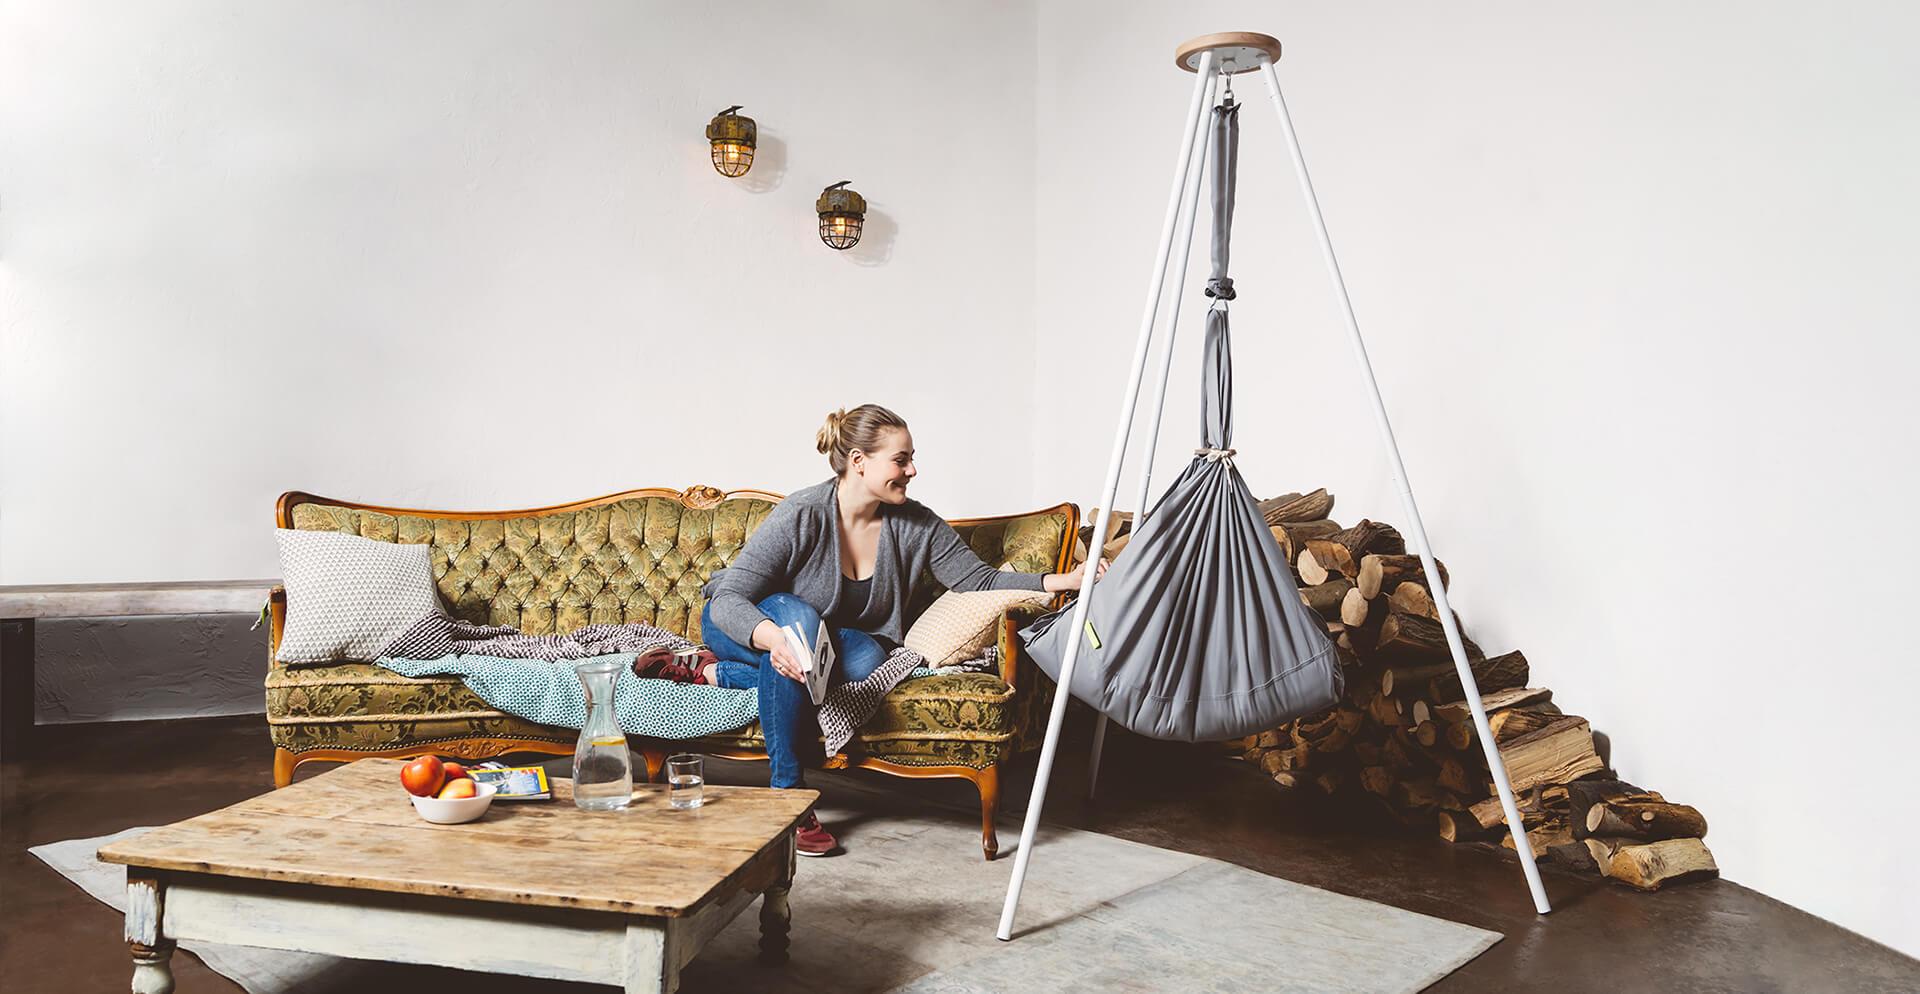 nonomo federwiege babywiege babyh ngematte. Black Bedroom Furniture Sets. Home Design Ideas